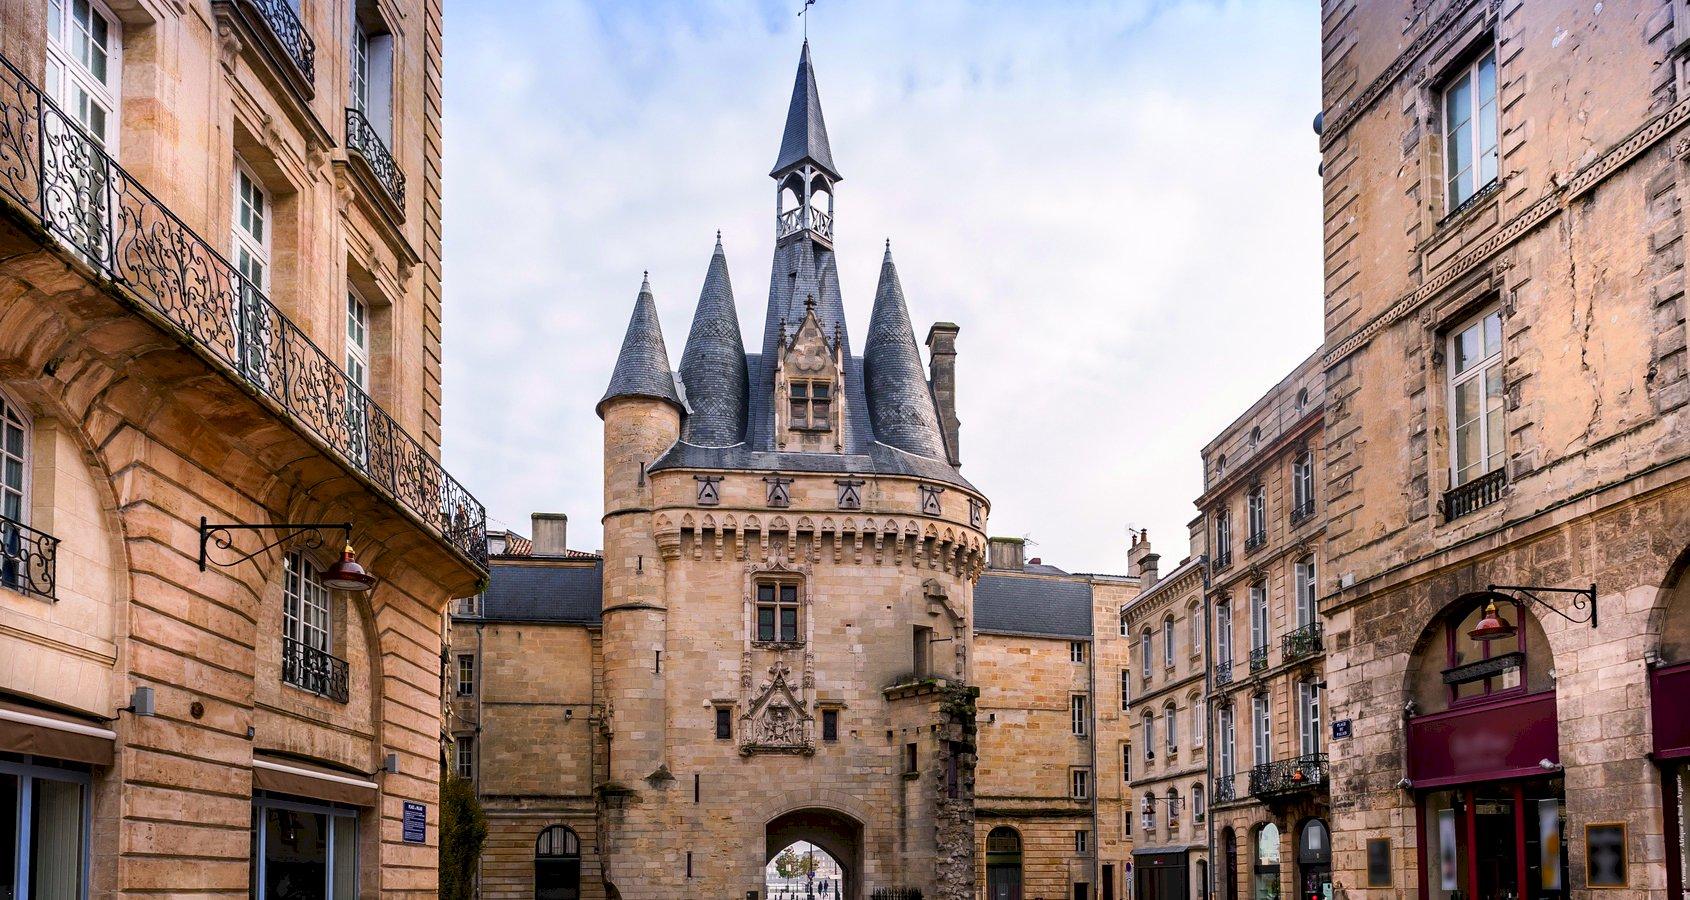 Ophorus Tours - Bordeaux Visit & Half Day Wine Tour Private Day Trip From Bordeaux